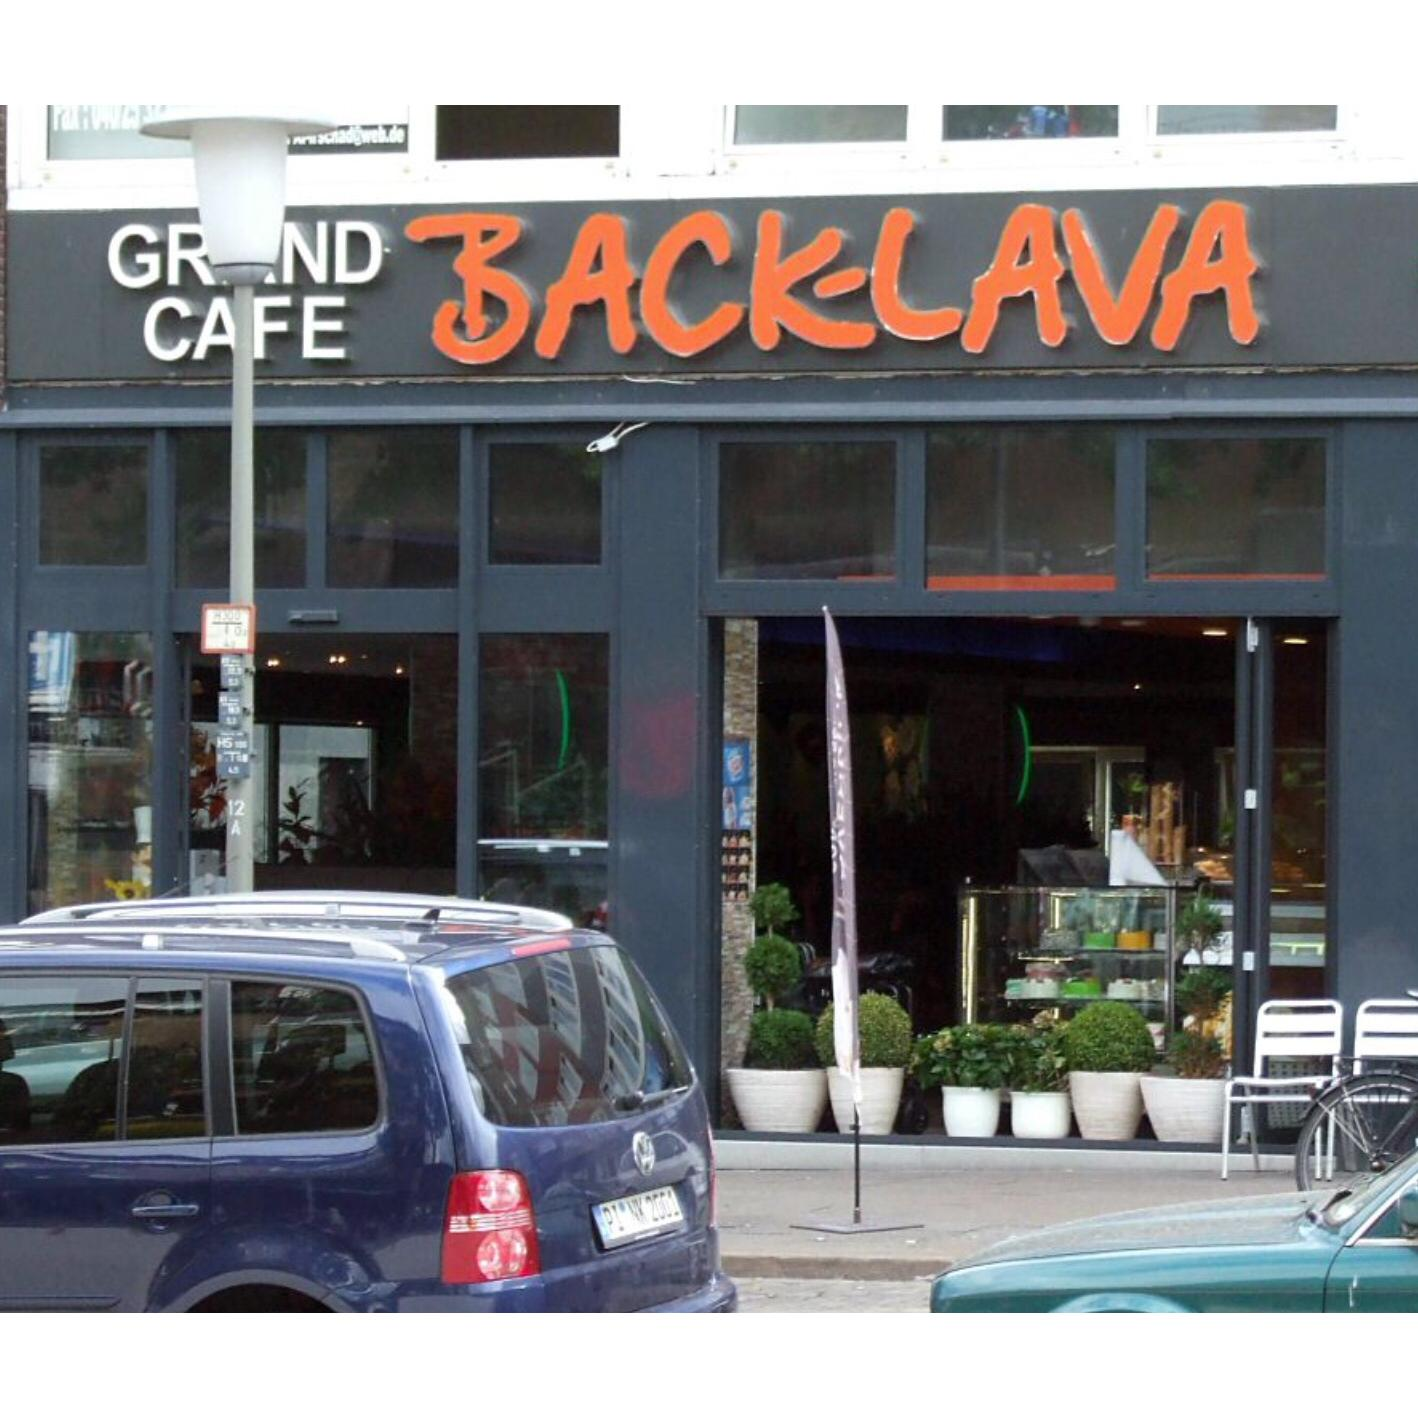 Grand Cafe Back-Lava GmbH